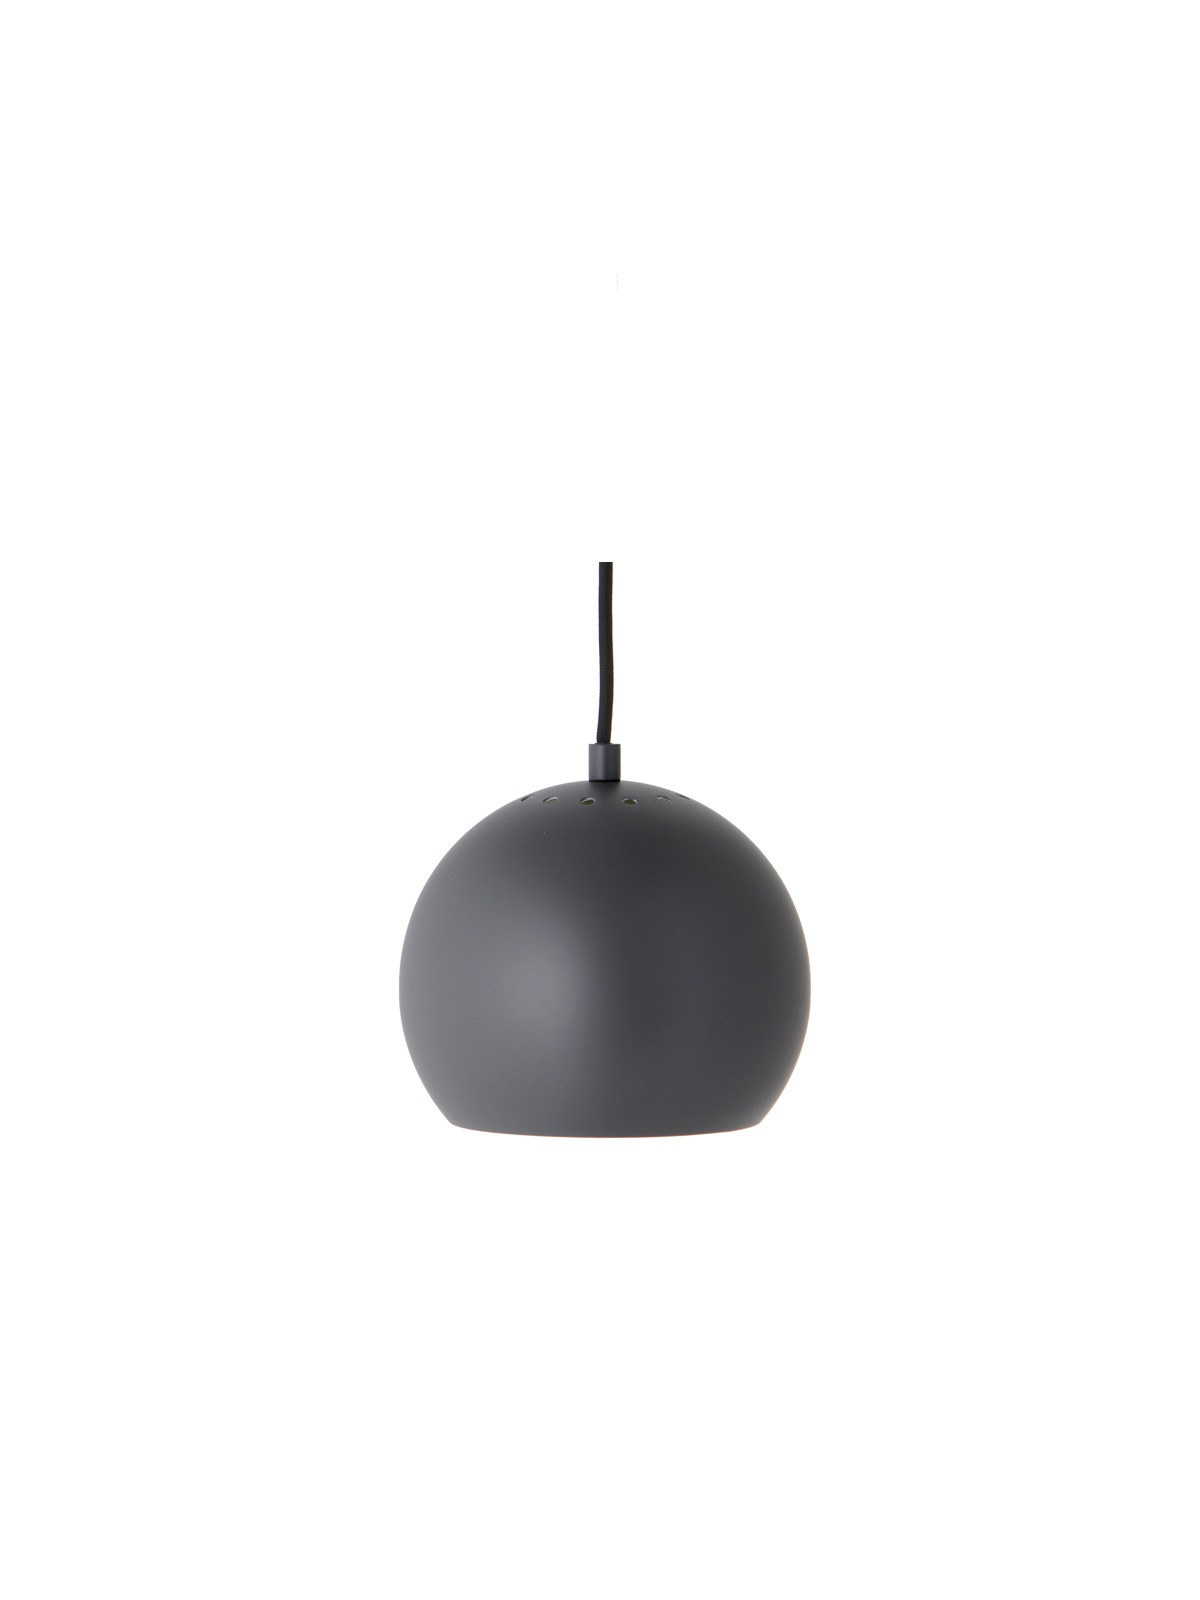 Frandsen Leuchte Ball DesignOrt Onlineshop Lampen